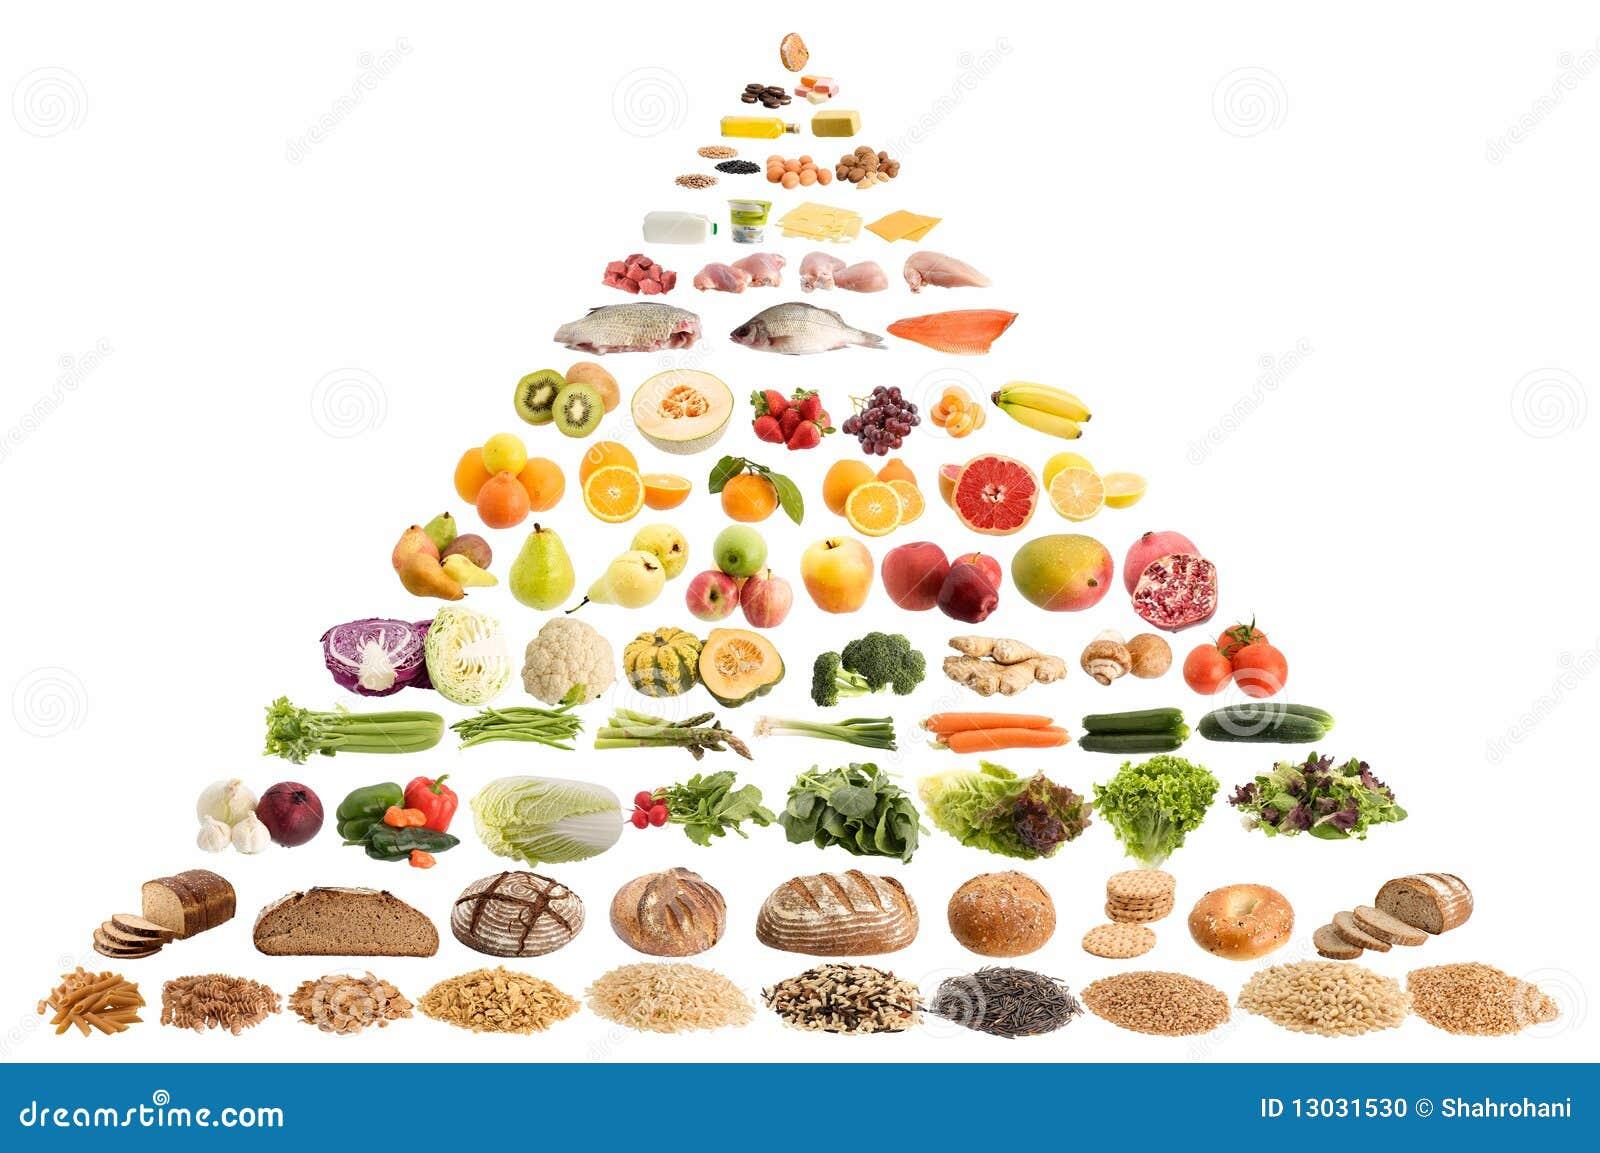 Food Pyramid Stock Photo Image Of Nobody Healthy